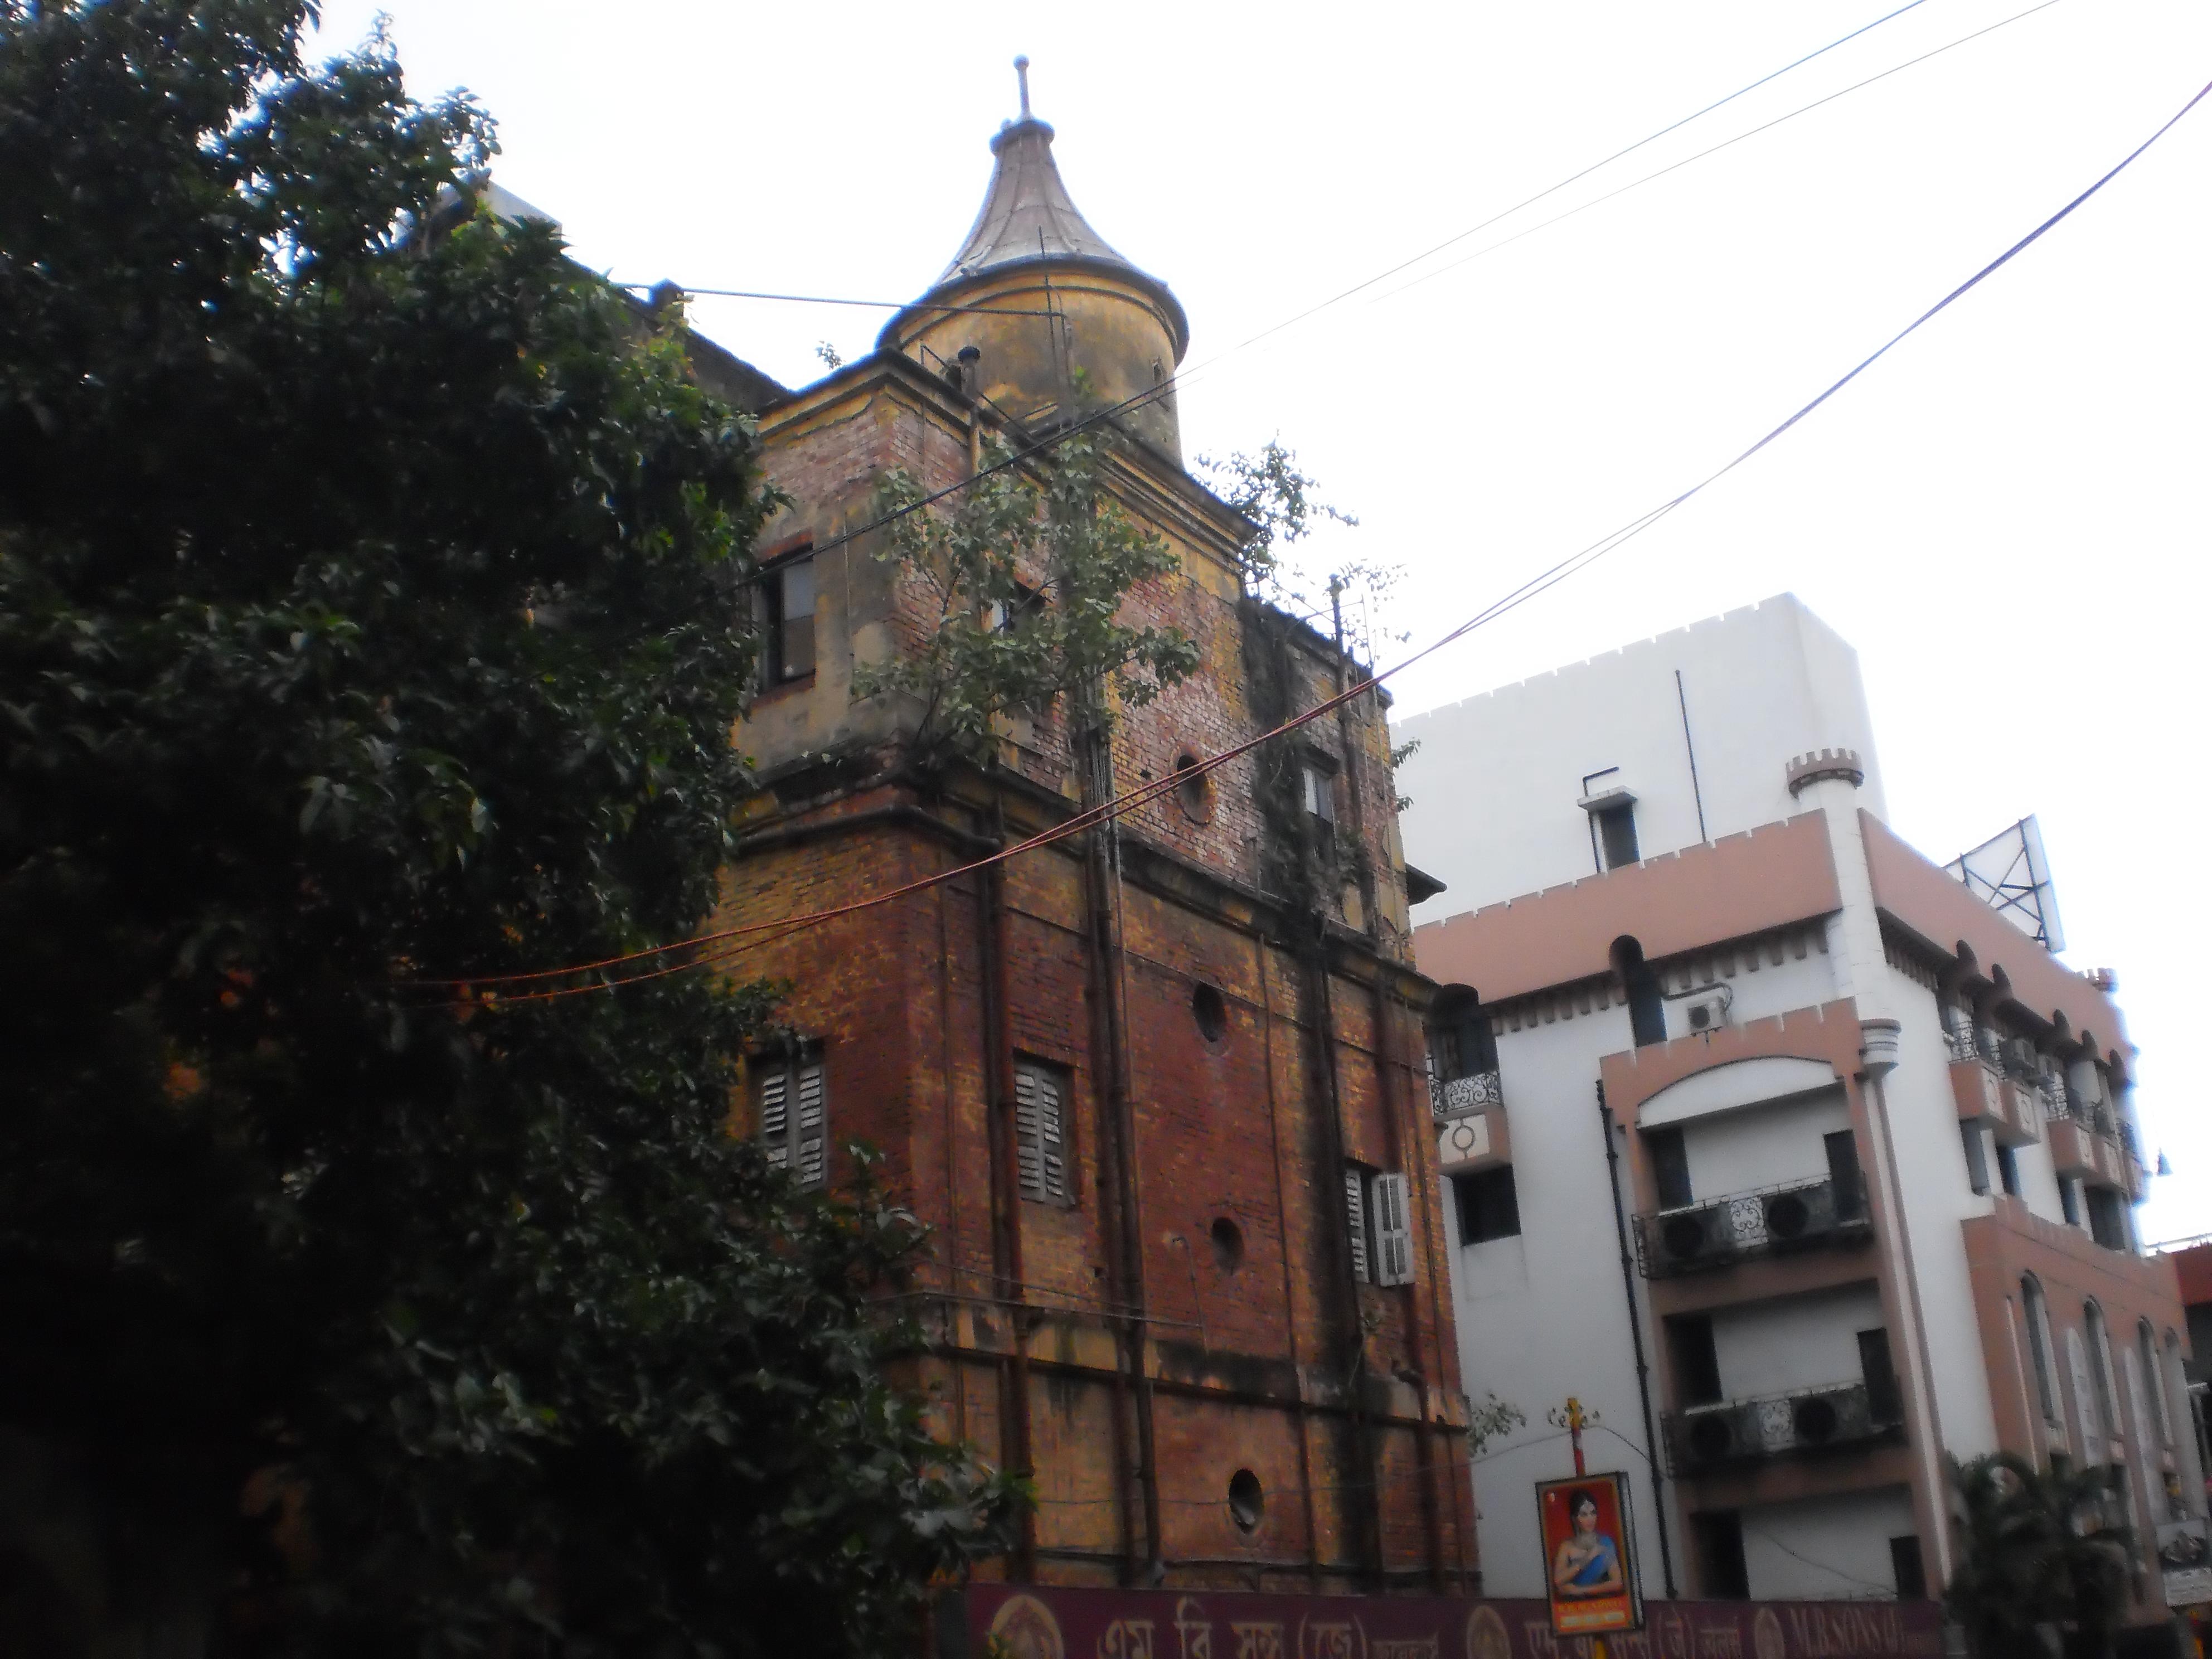 An old building on Esplanade Street-Kolkata